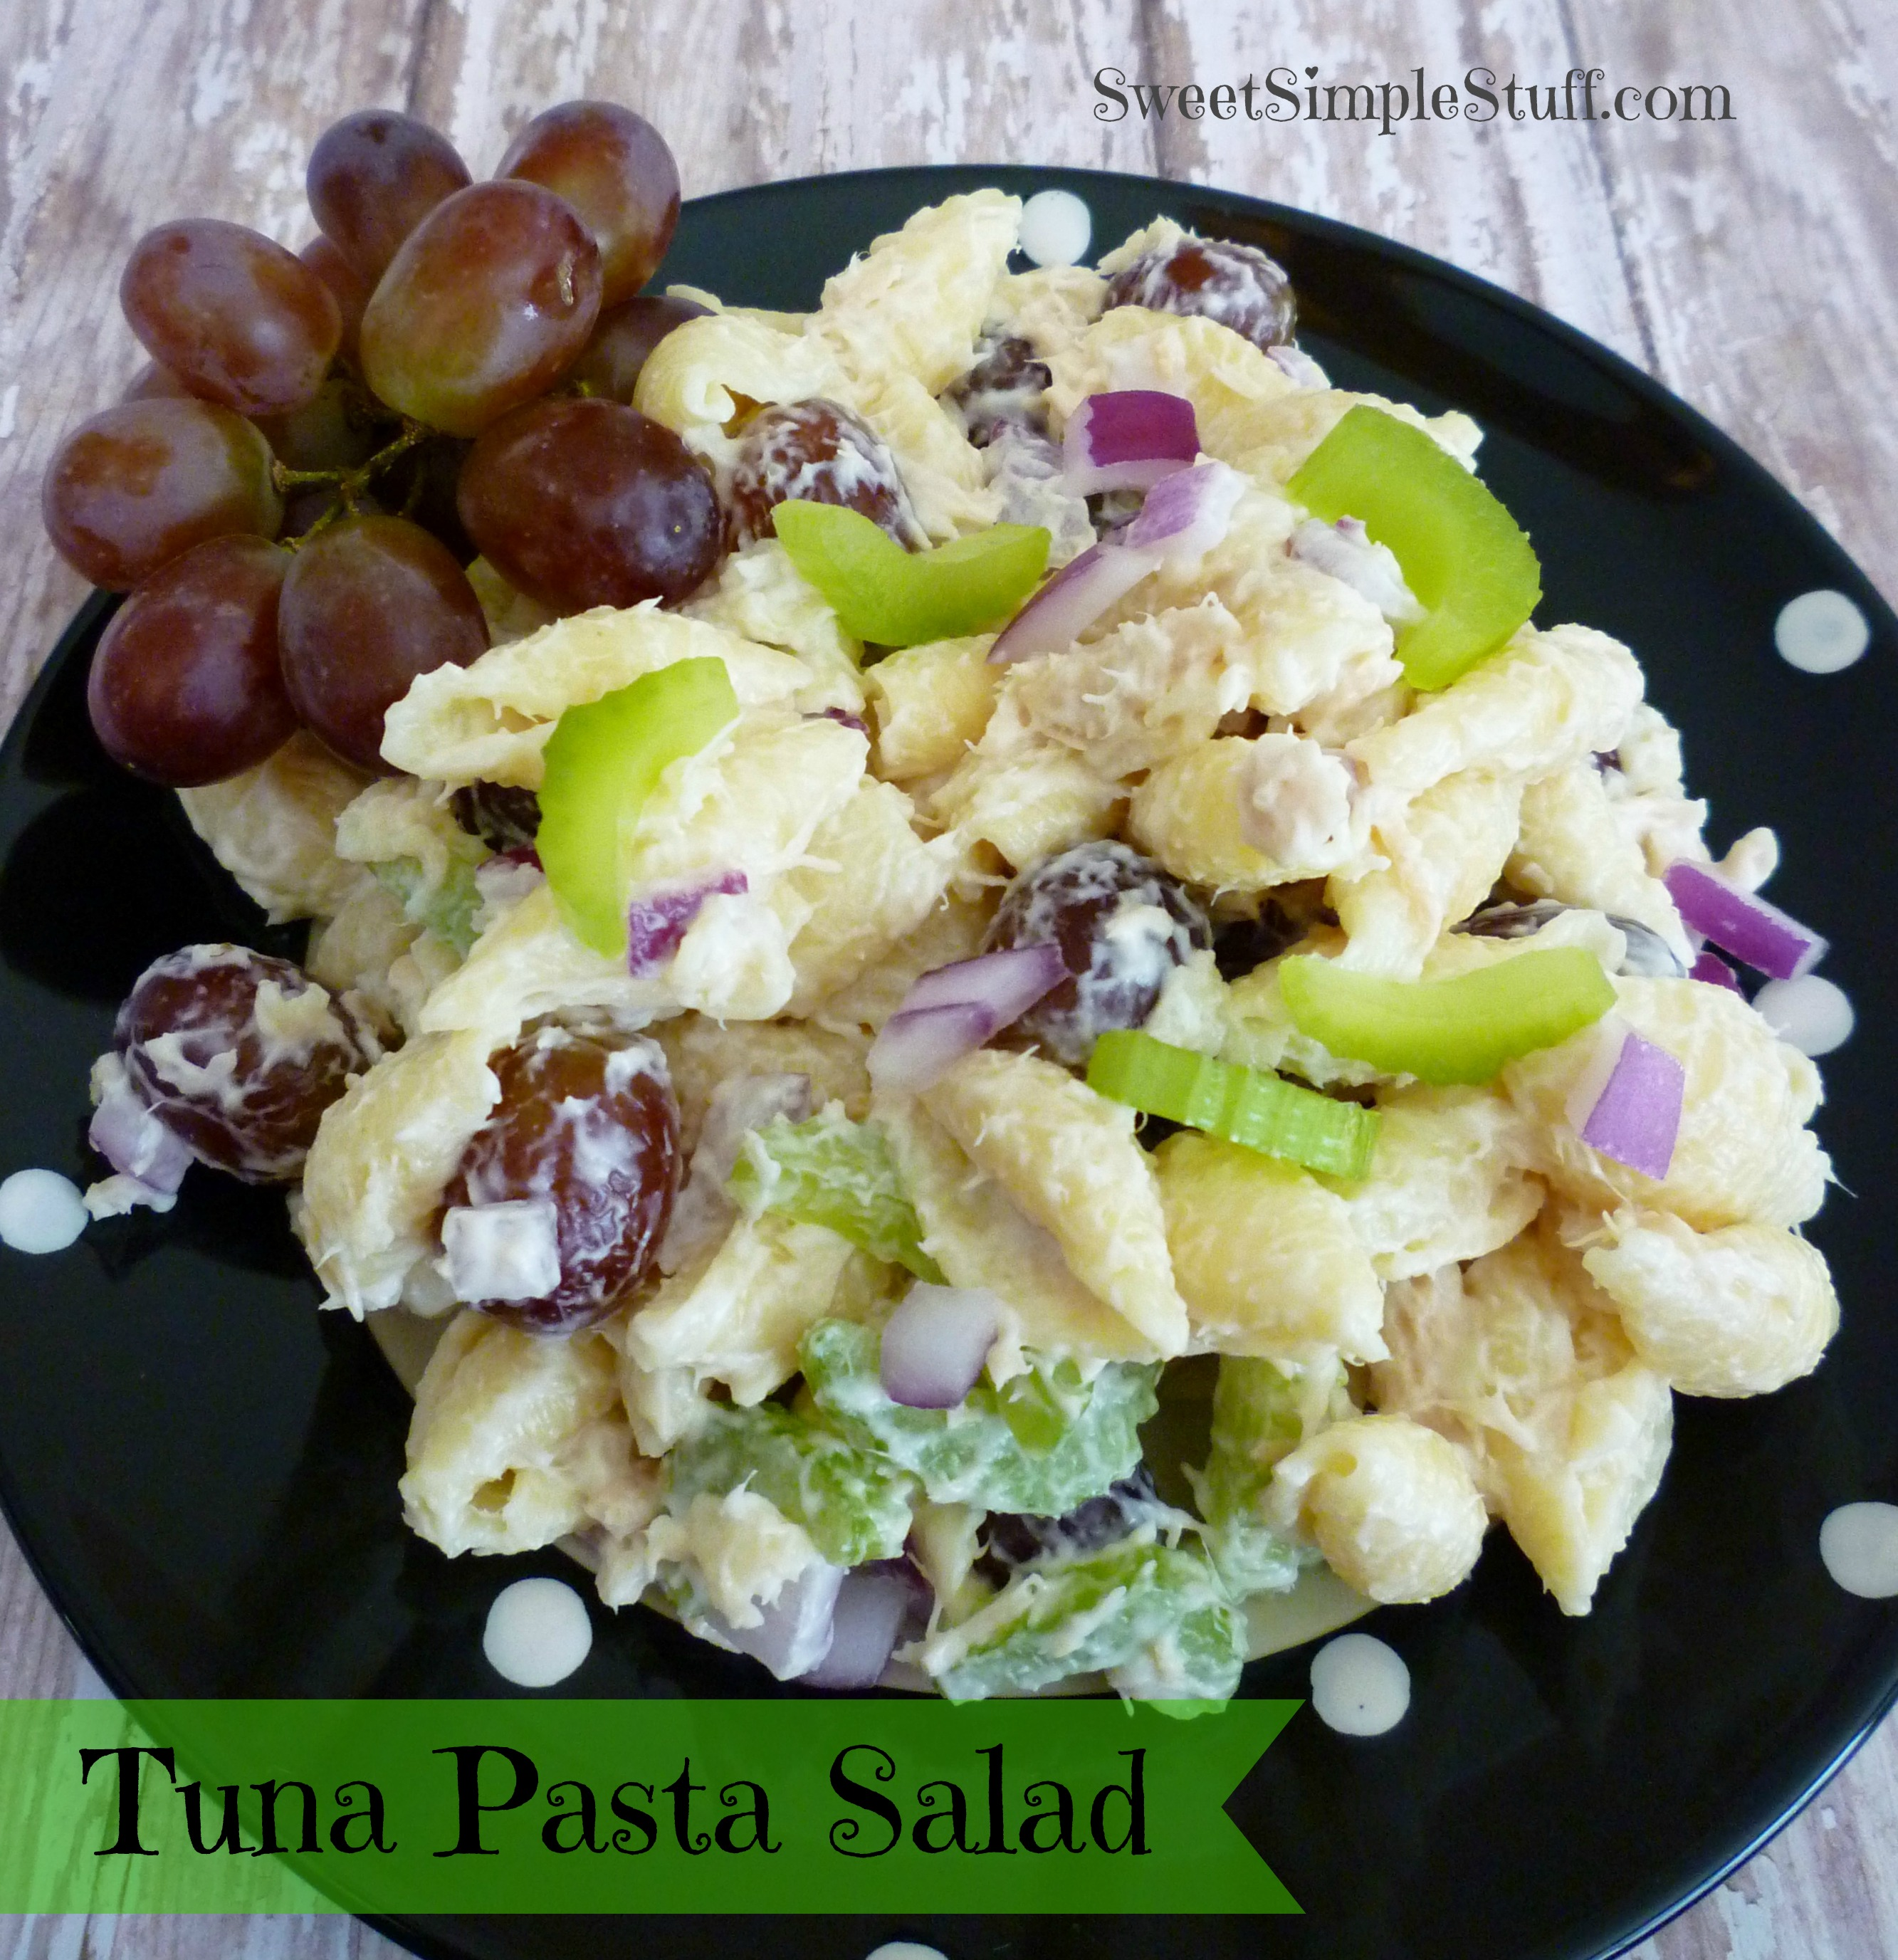 Tuna Pasta Salad | SWEET SIMPLE STUFF